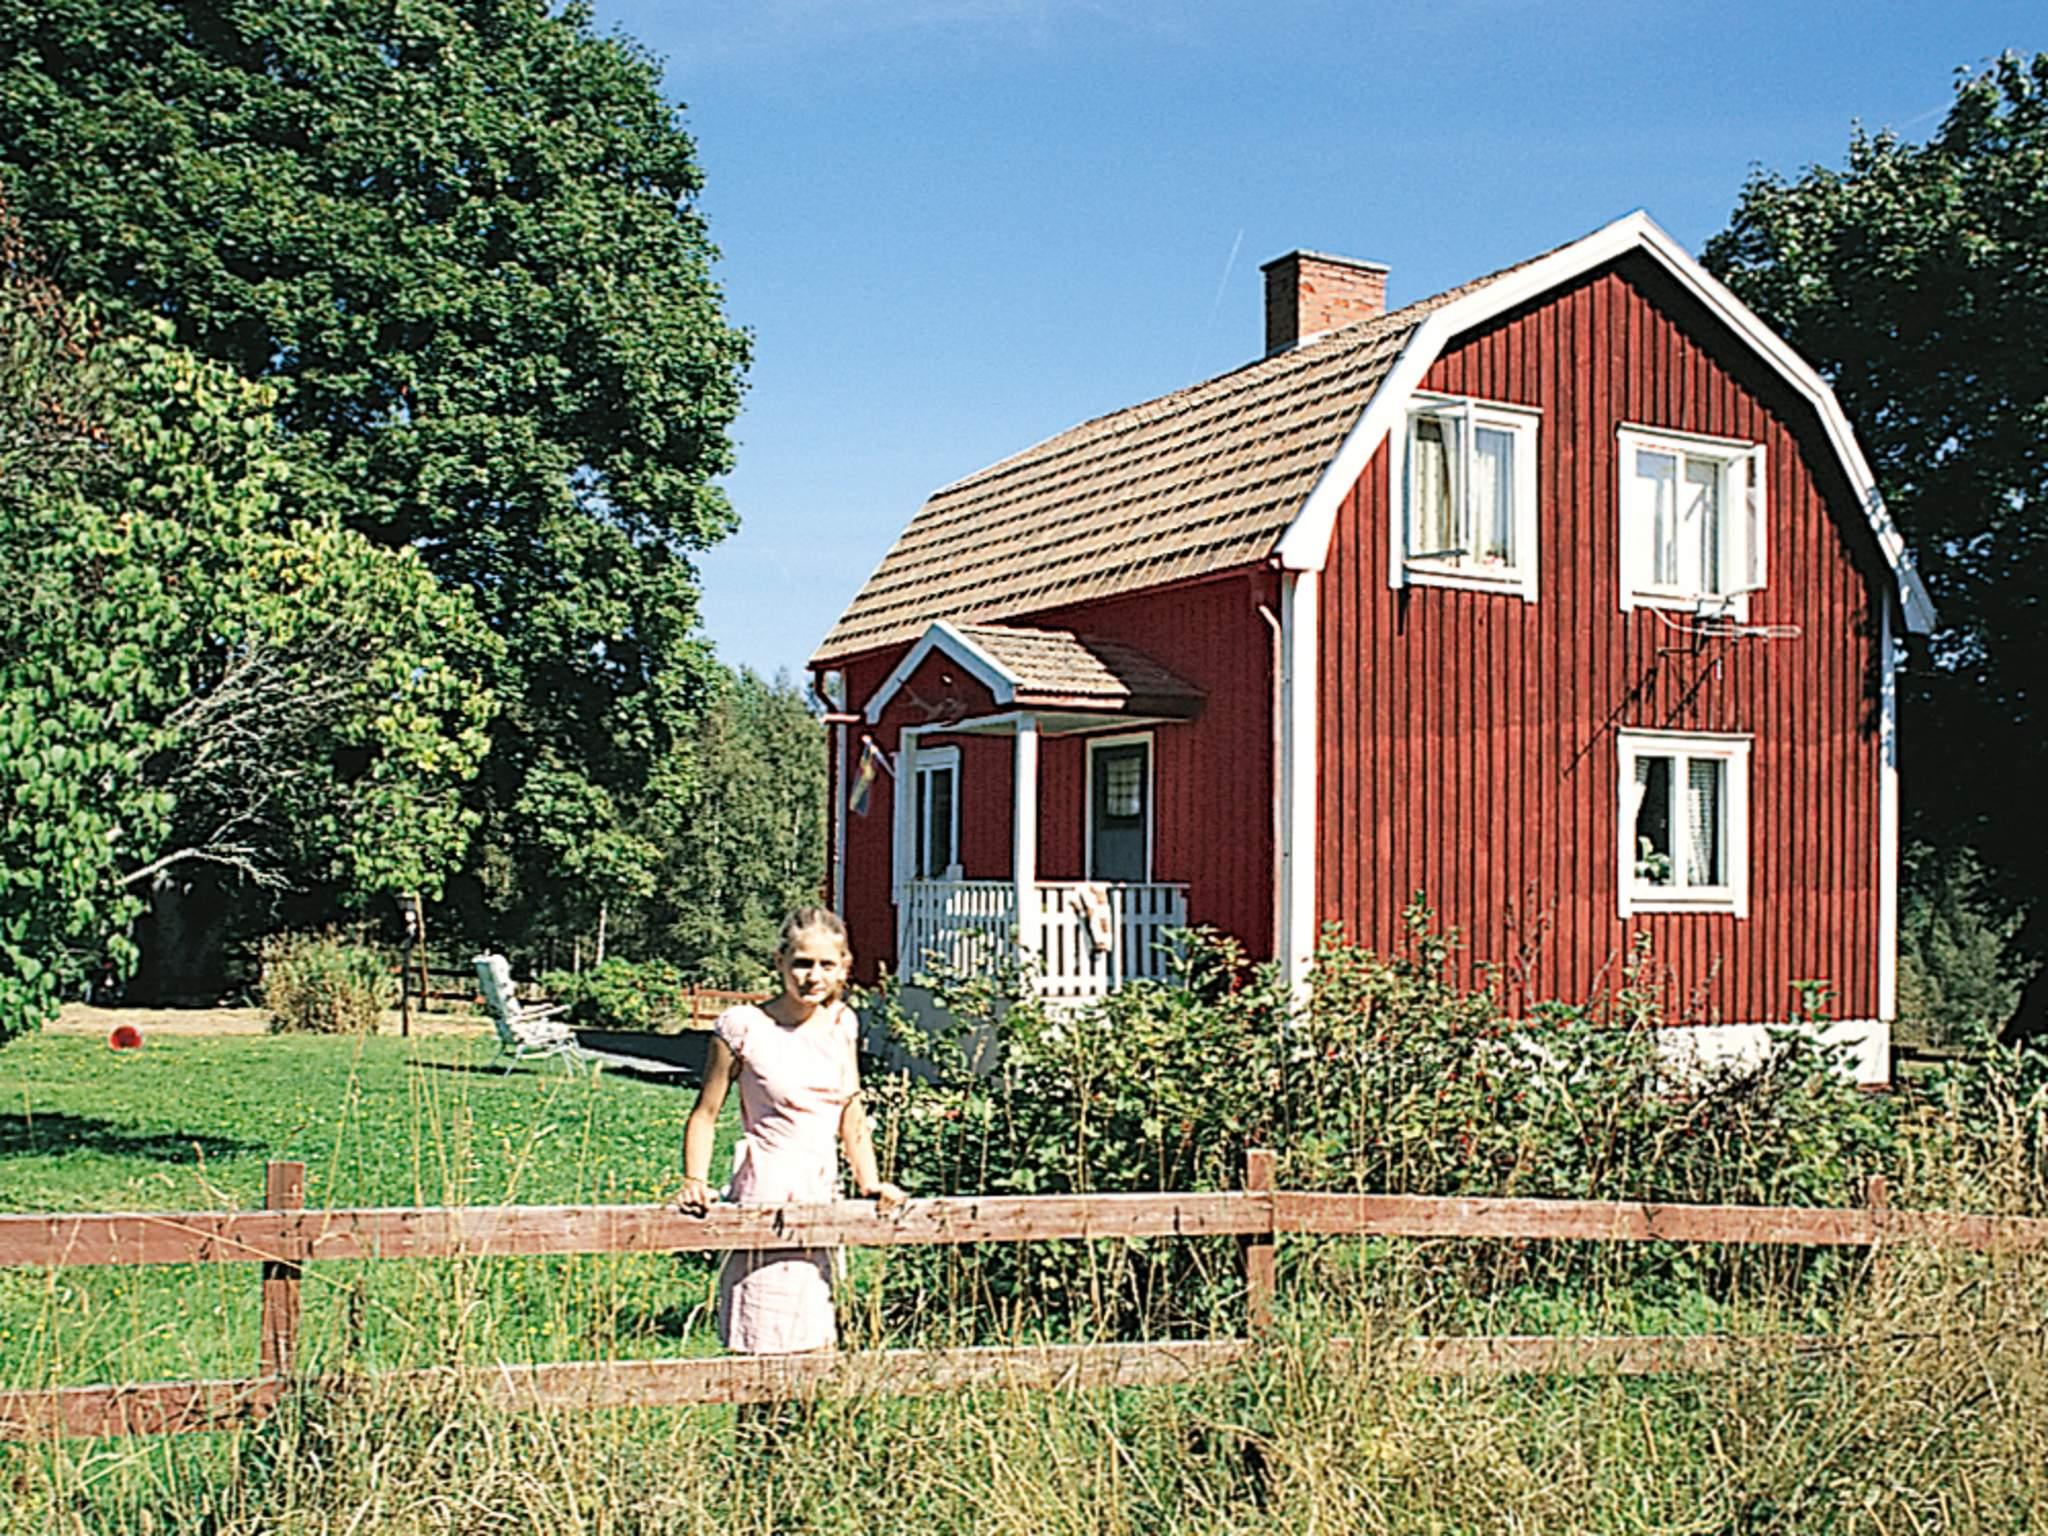 Ferienhaus Sundhultsbrunn (87123), Sunhultsbrunn, Jönköpings län, Südschweden, Schweden, Bild 1